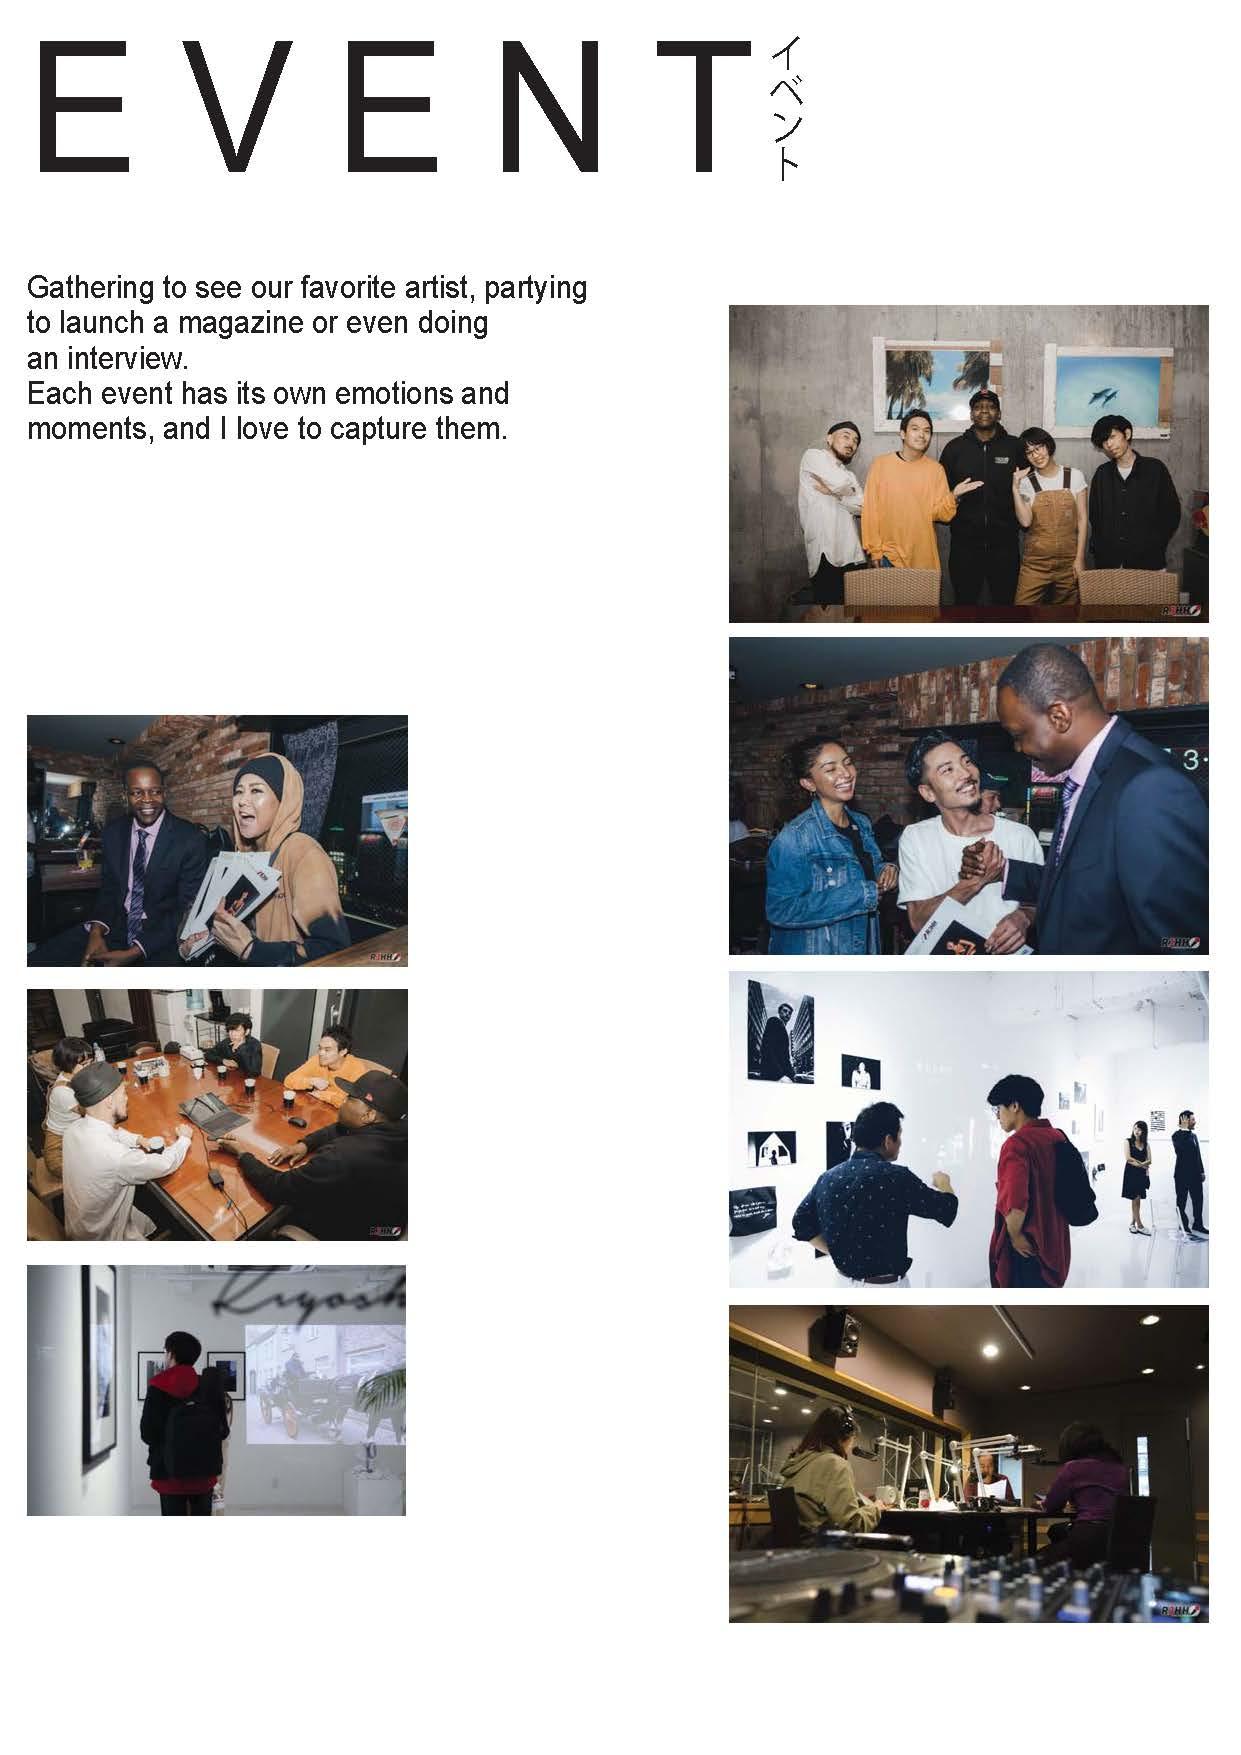 EVENT - Art Exhibition & Magazine Event